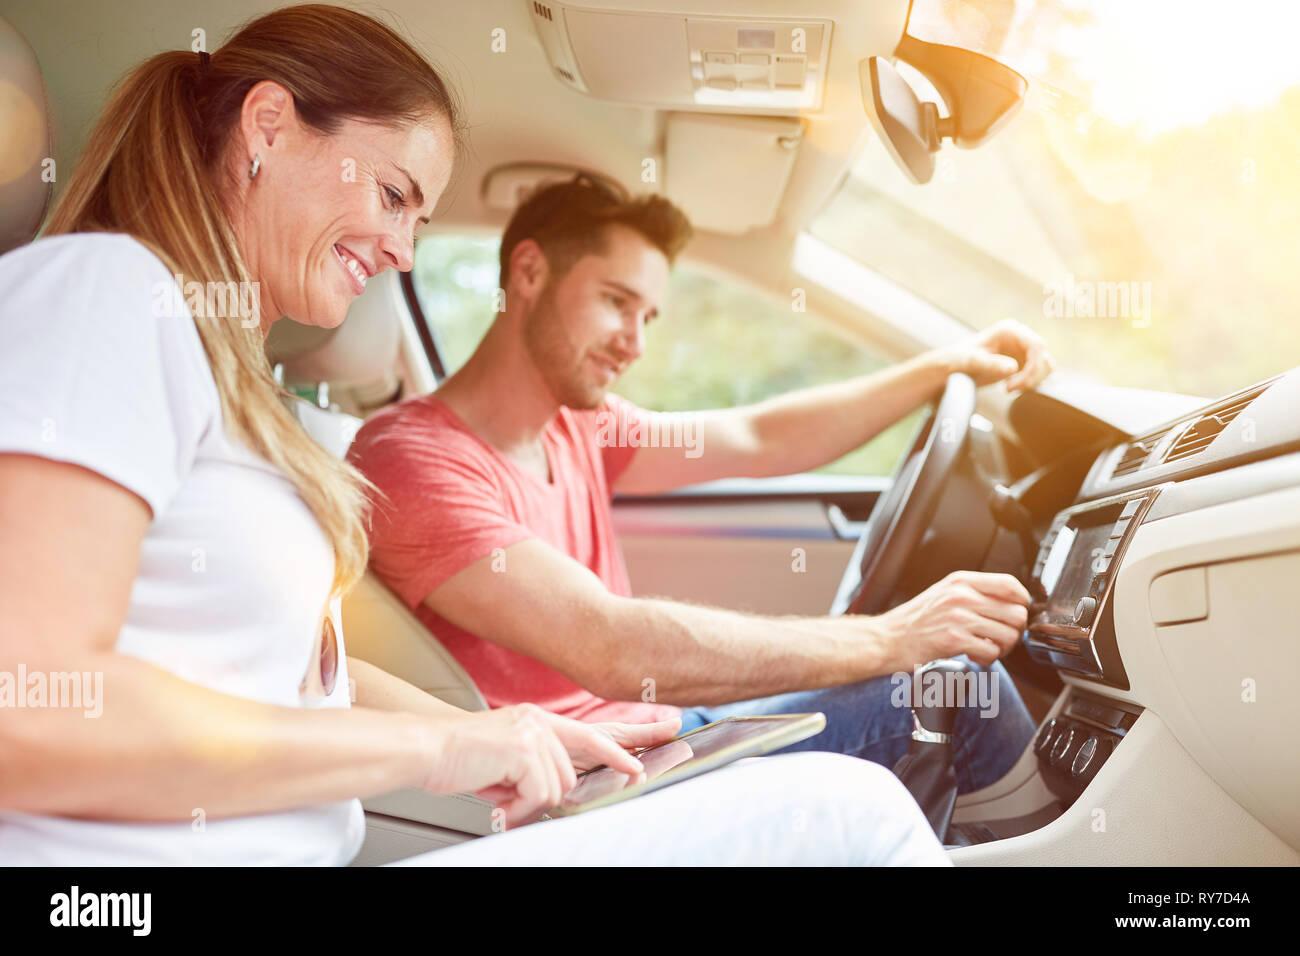 Couple uses GPS as Navi while driving on tablet computer - Stock Image